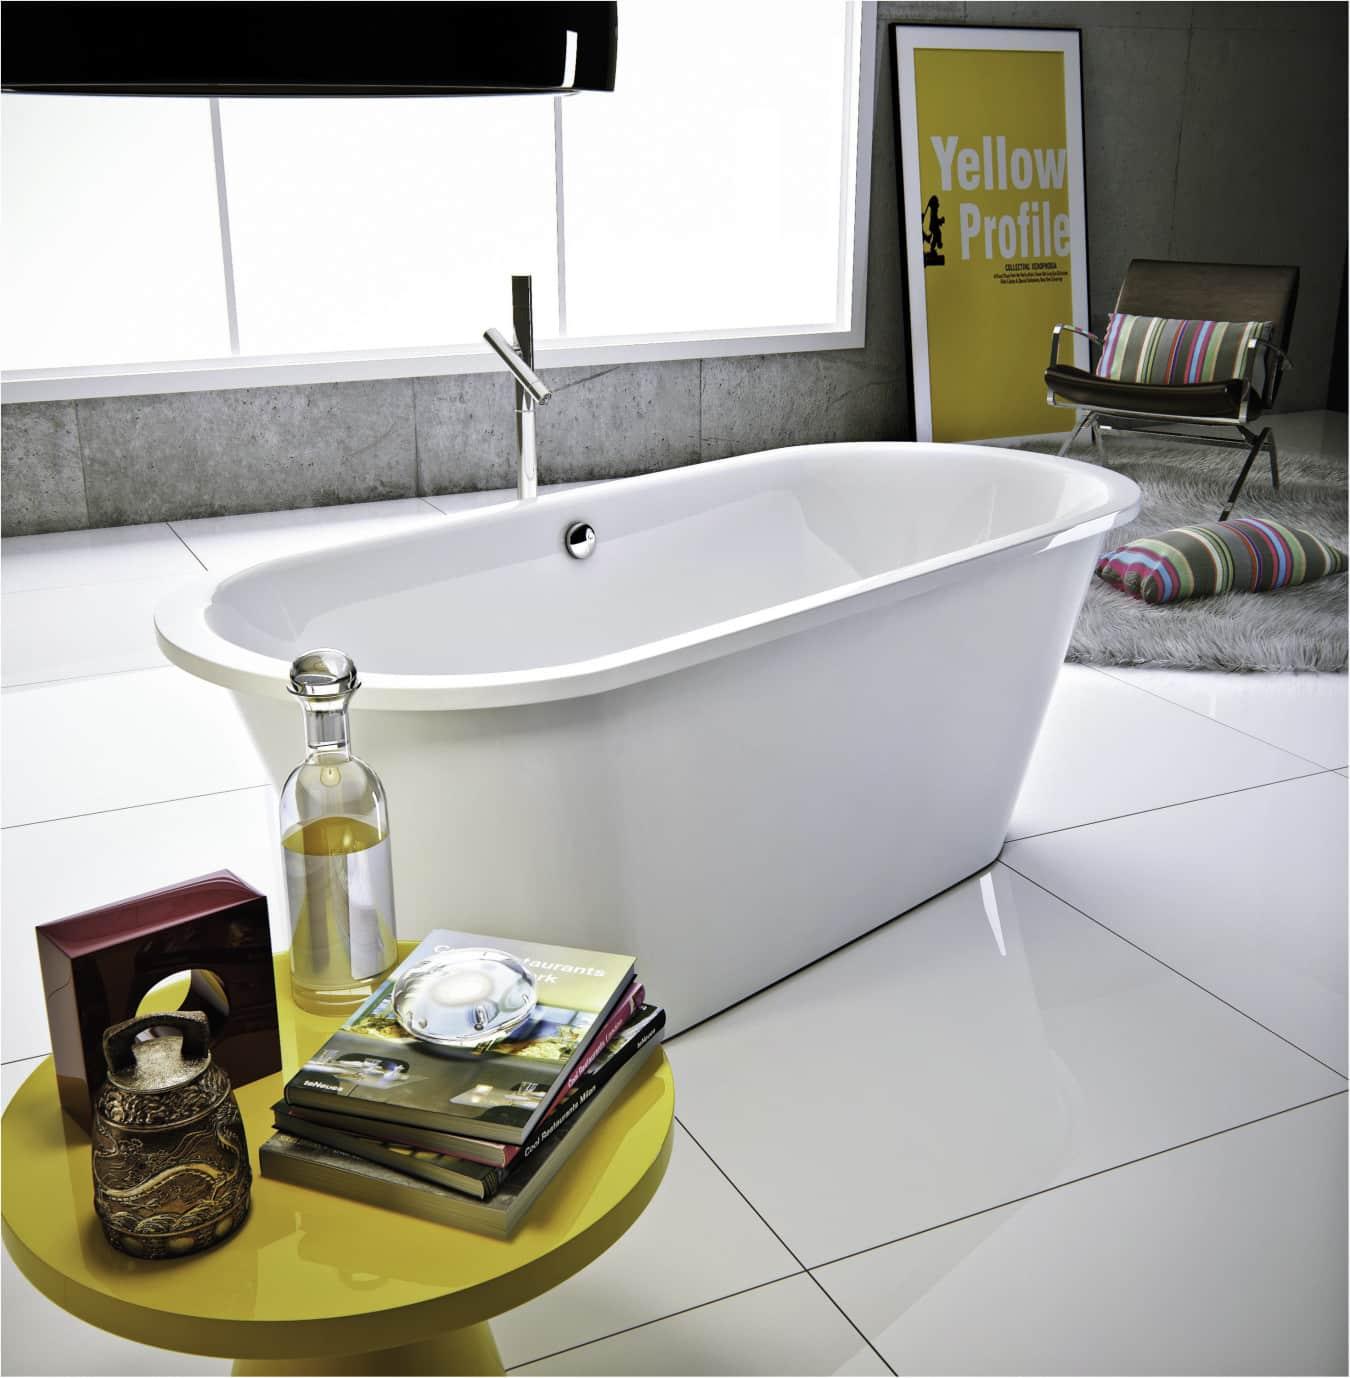 Interbagno Sabbia Banheira Brisa alta - Banheiros modernos